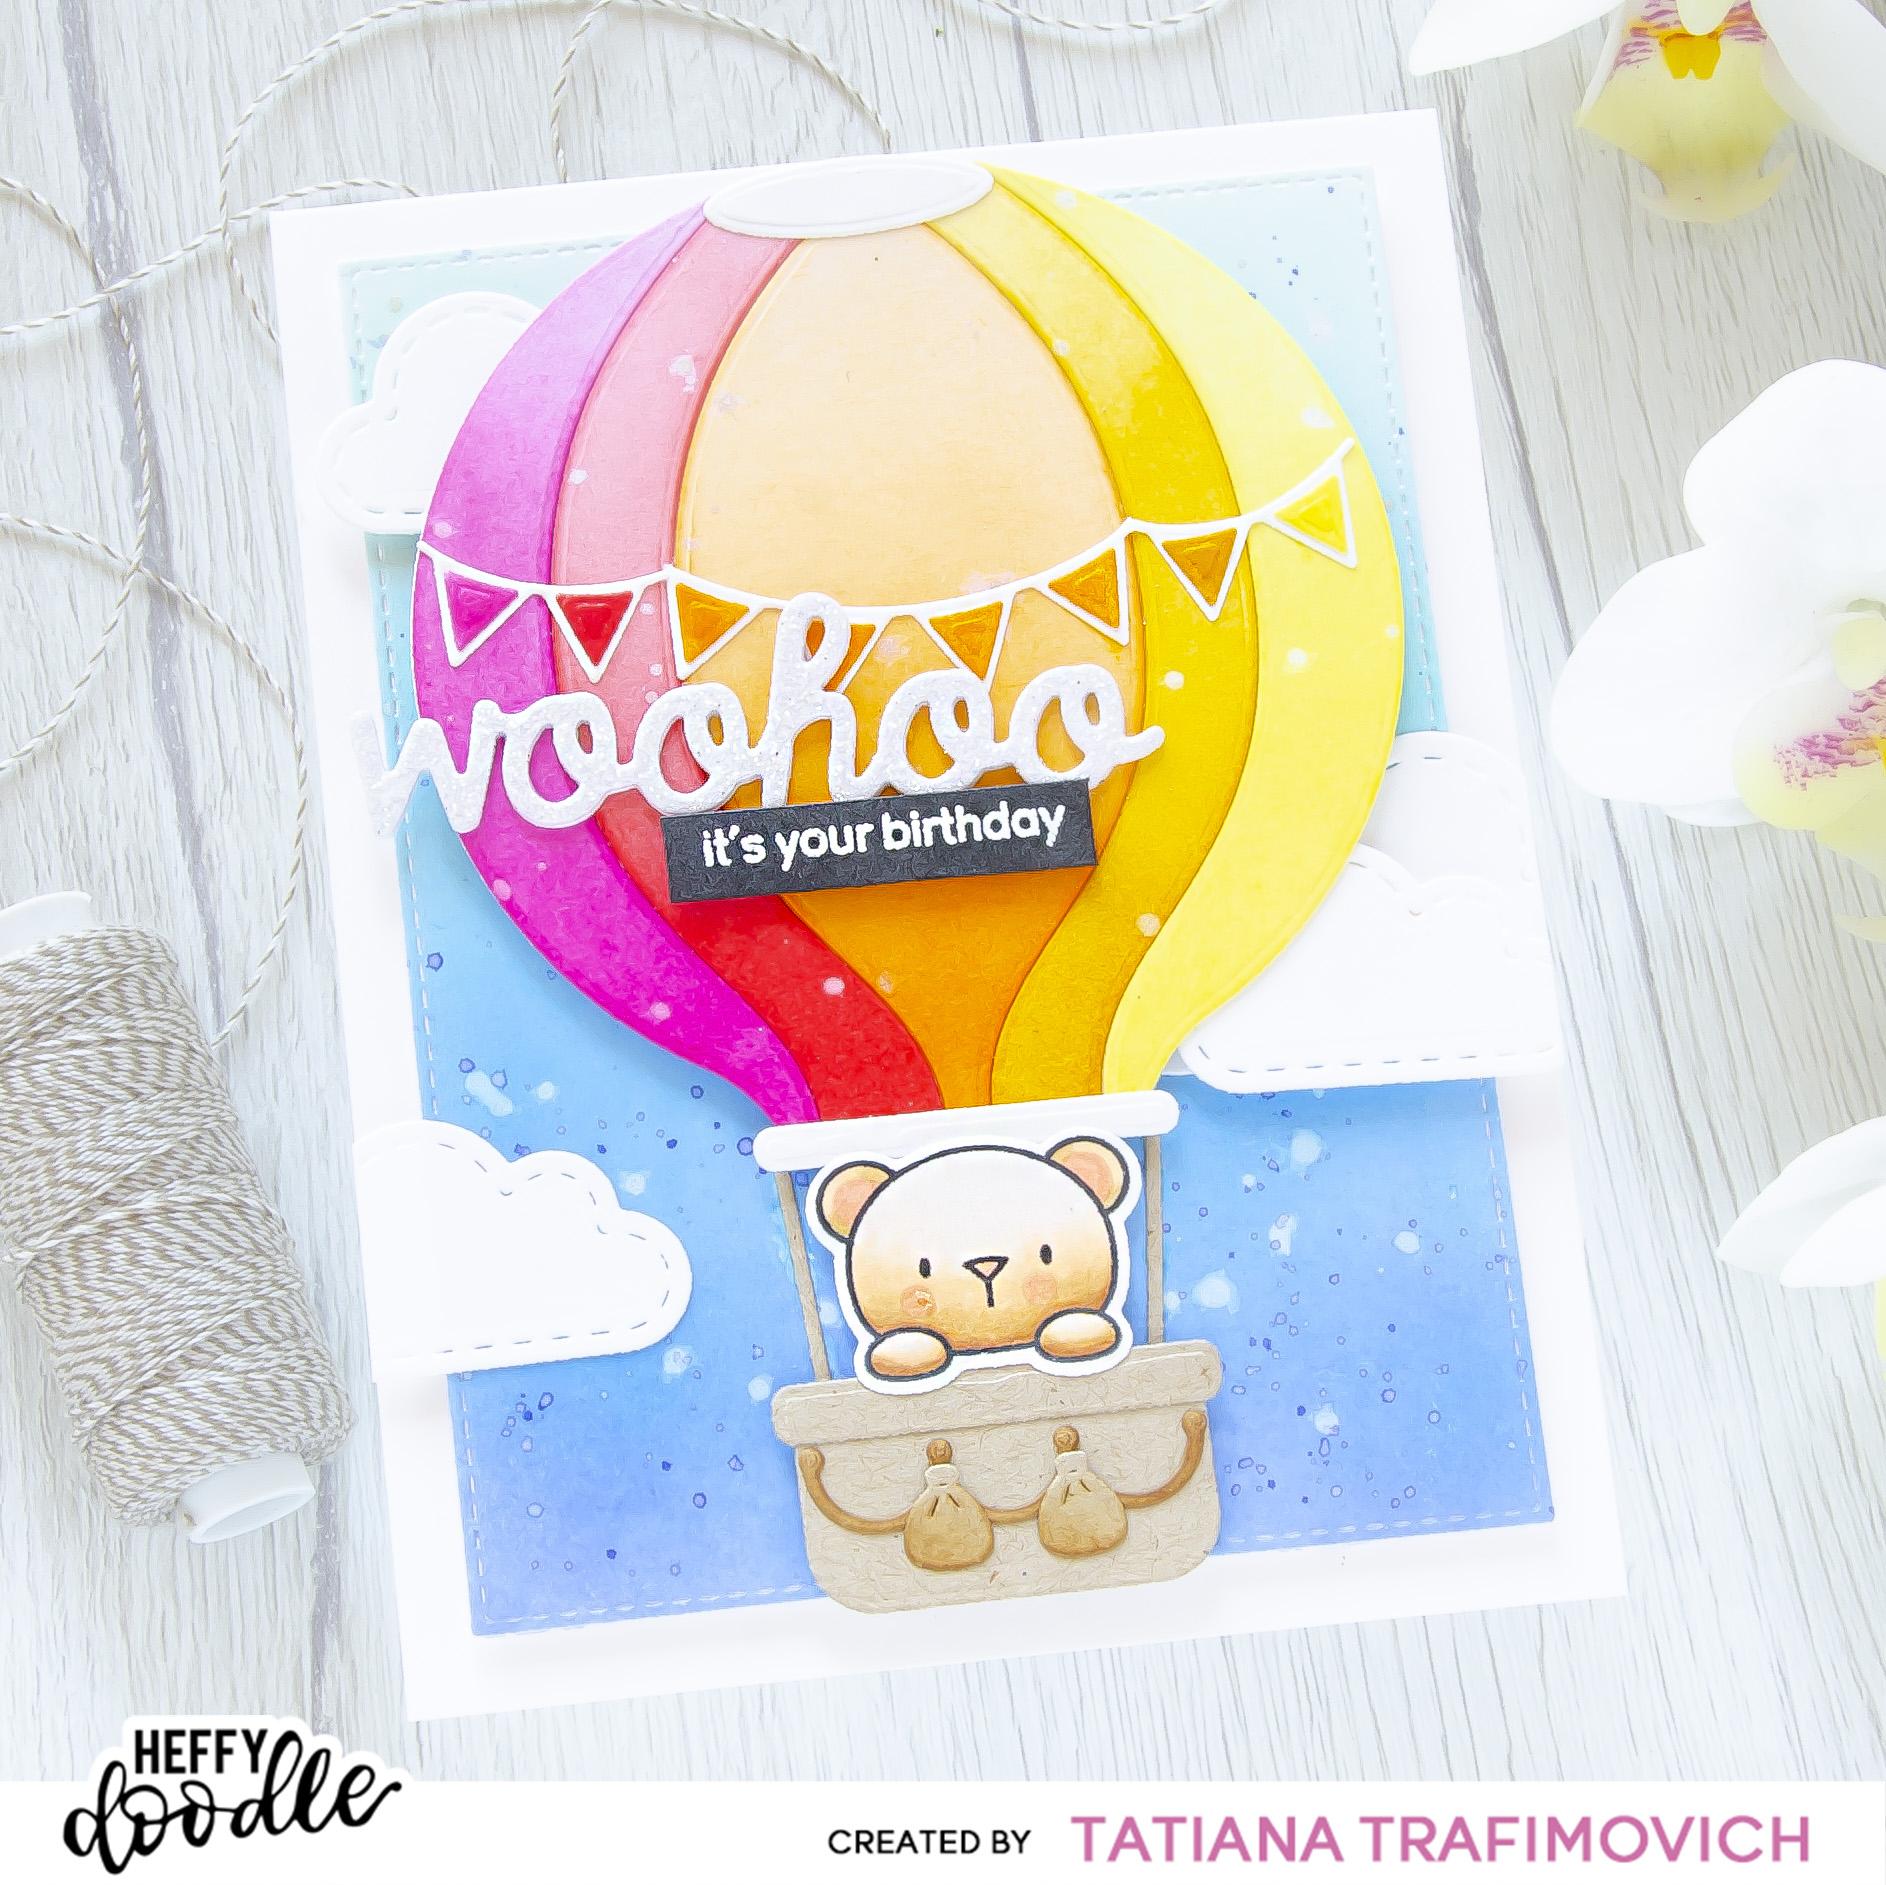 WooHoo birthday #handmade card by Tatiana Trafimovich #tatianacraftandart - Hot Air Balloon Die by Heffy Doodle #heffydoodle